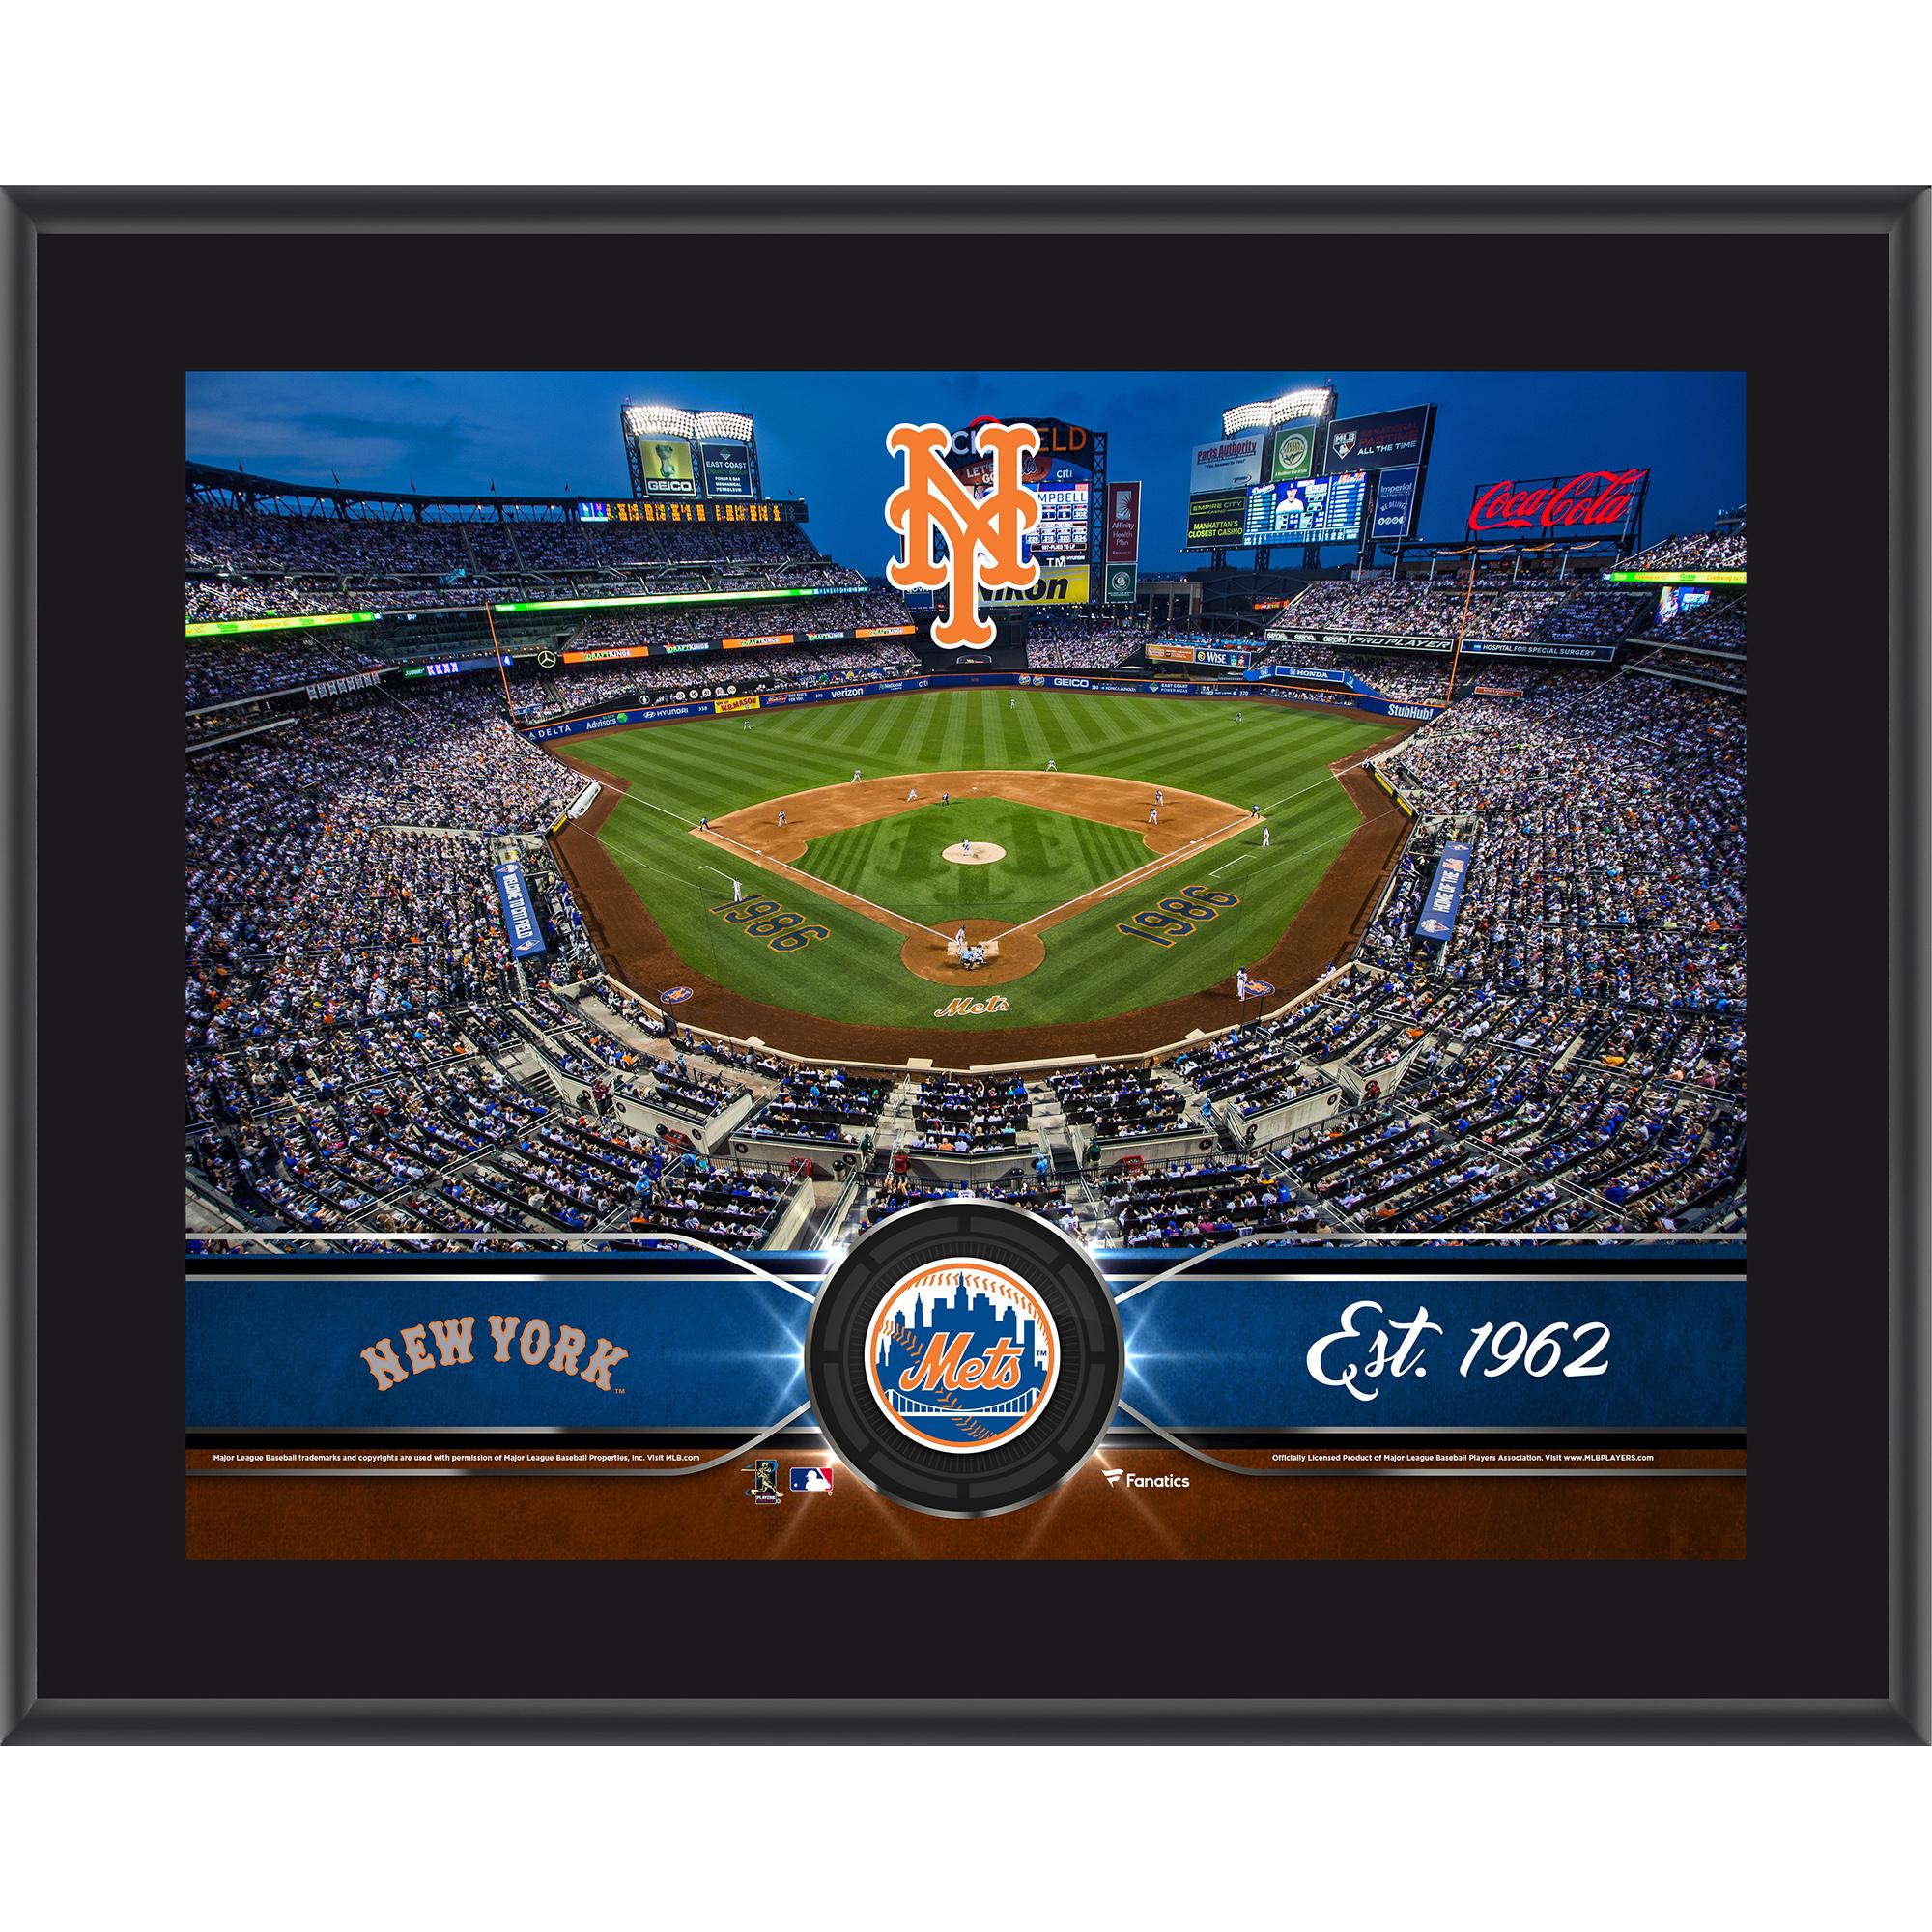 "New York Mets Fanatics Authentic 10.5"" x 13"" Sublimated Team Plaque - No Size"